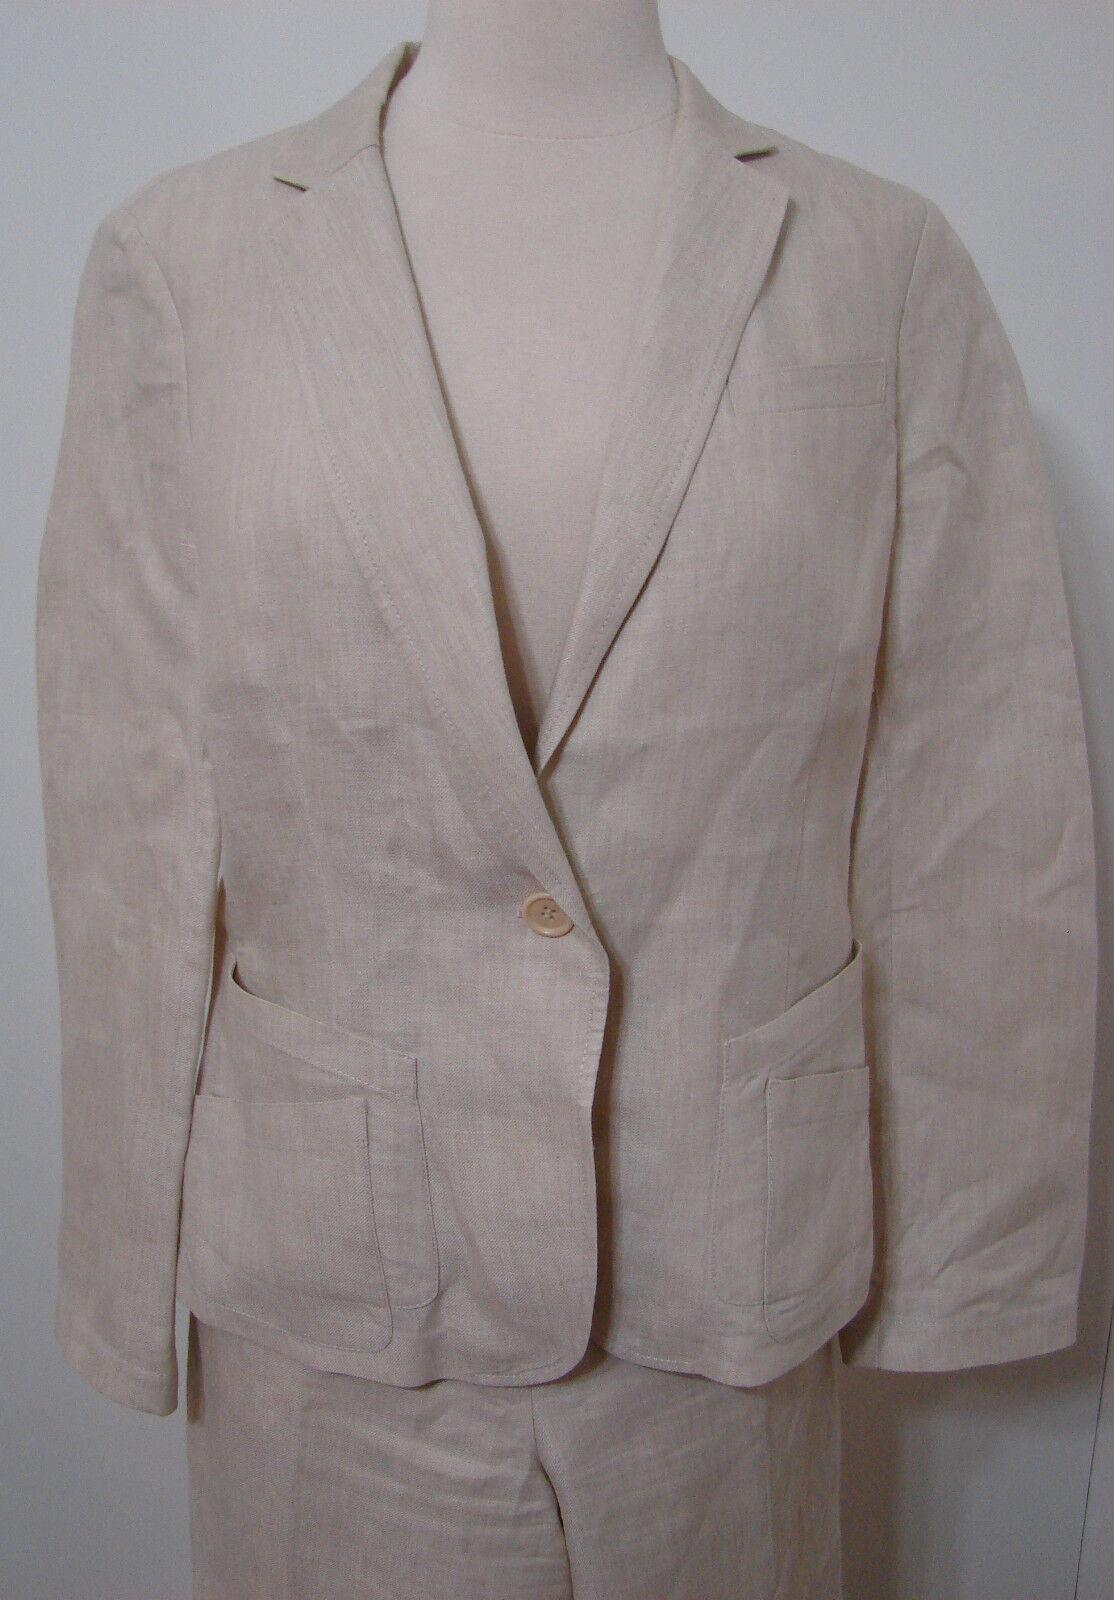 Donna Karan DKNY Pant Suit & Jacket Cream 100% Li… - image 2